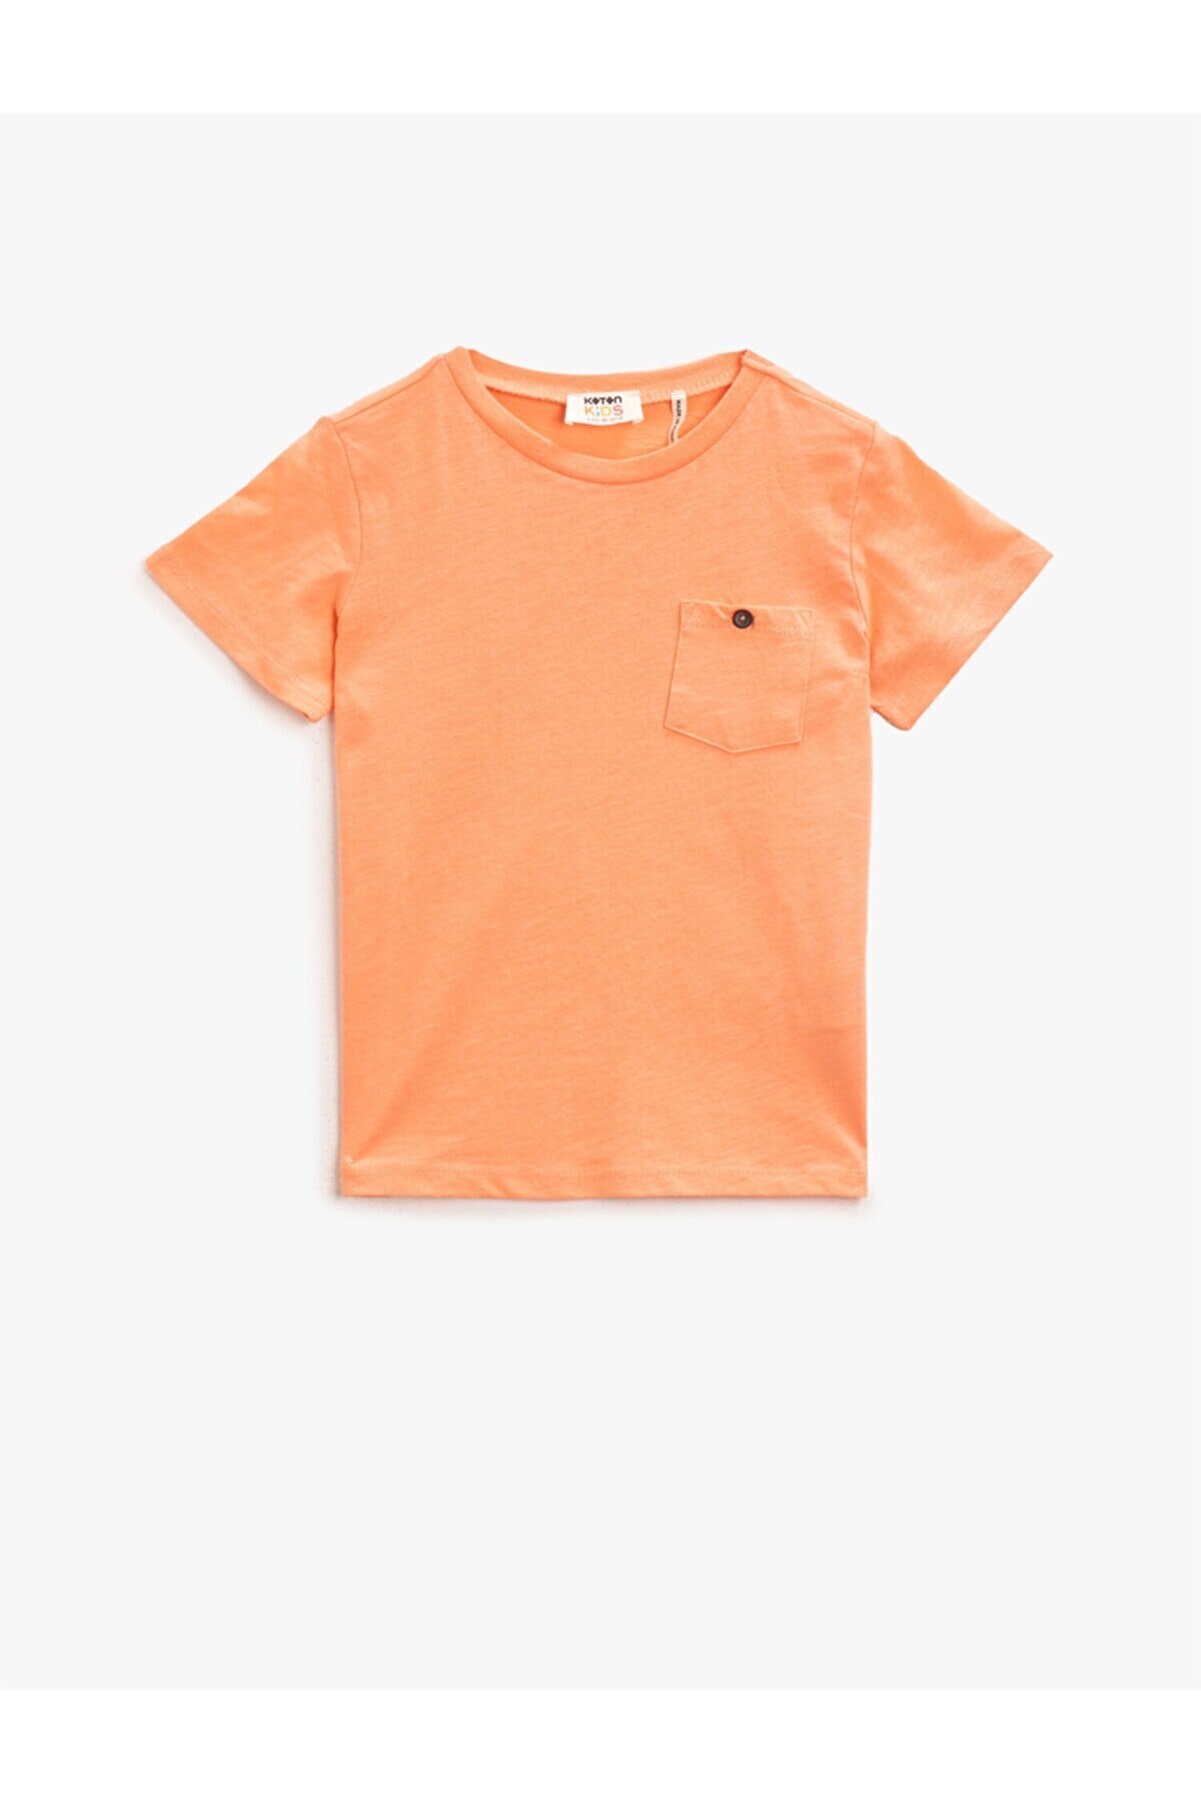 Koton Erkek Çocuk Pudra Düz Pamuklu Cepli Bisiklet Yaka Kisa Kollu T-Shirt